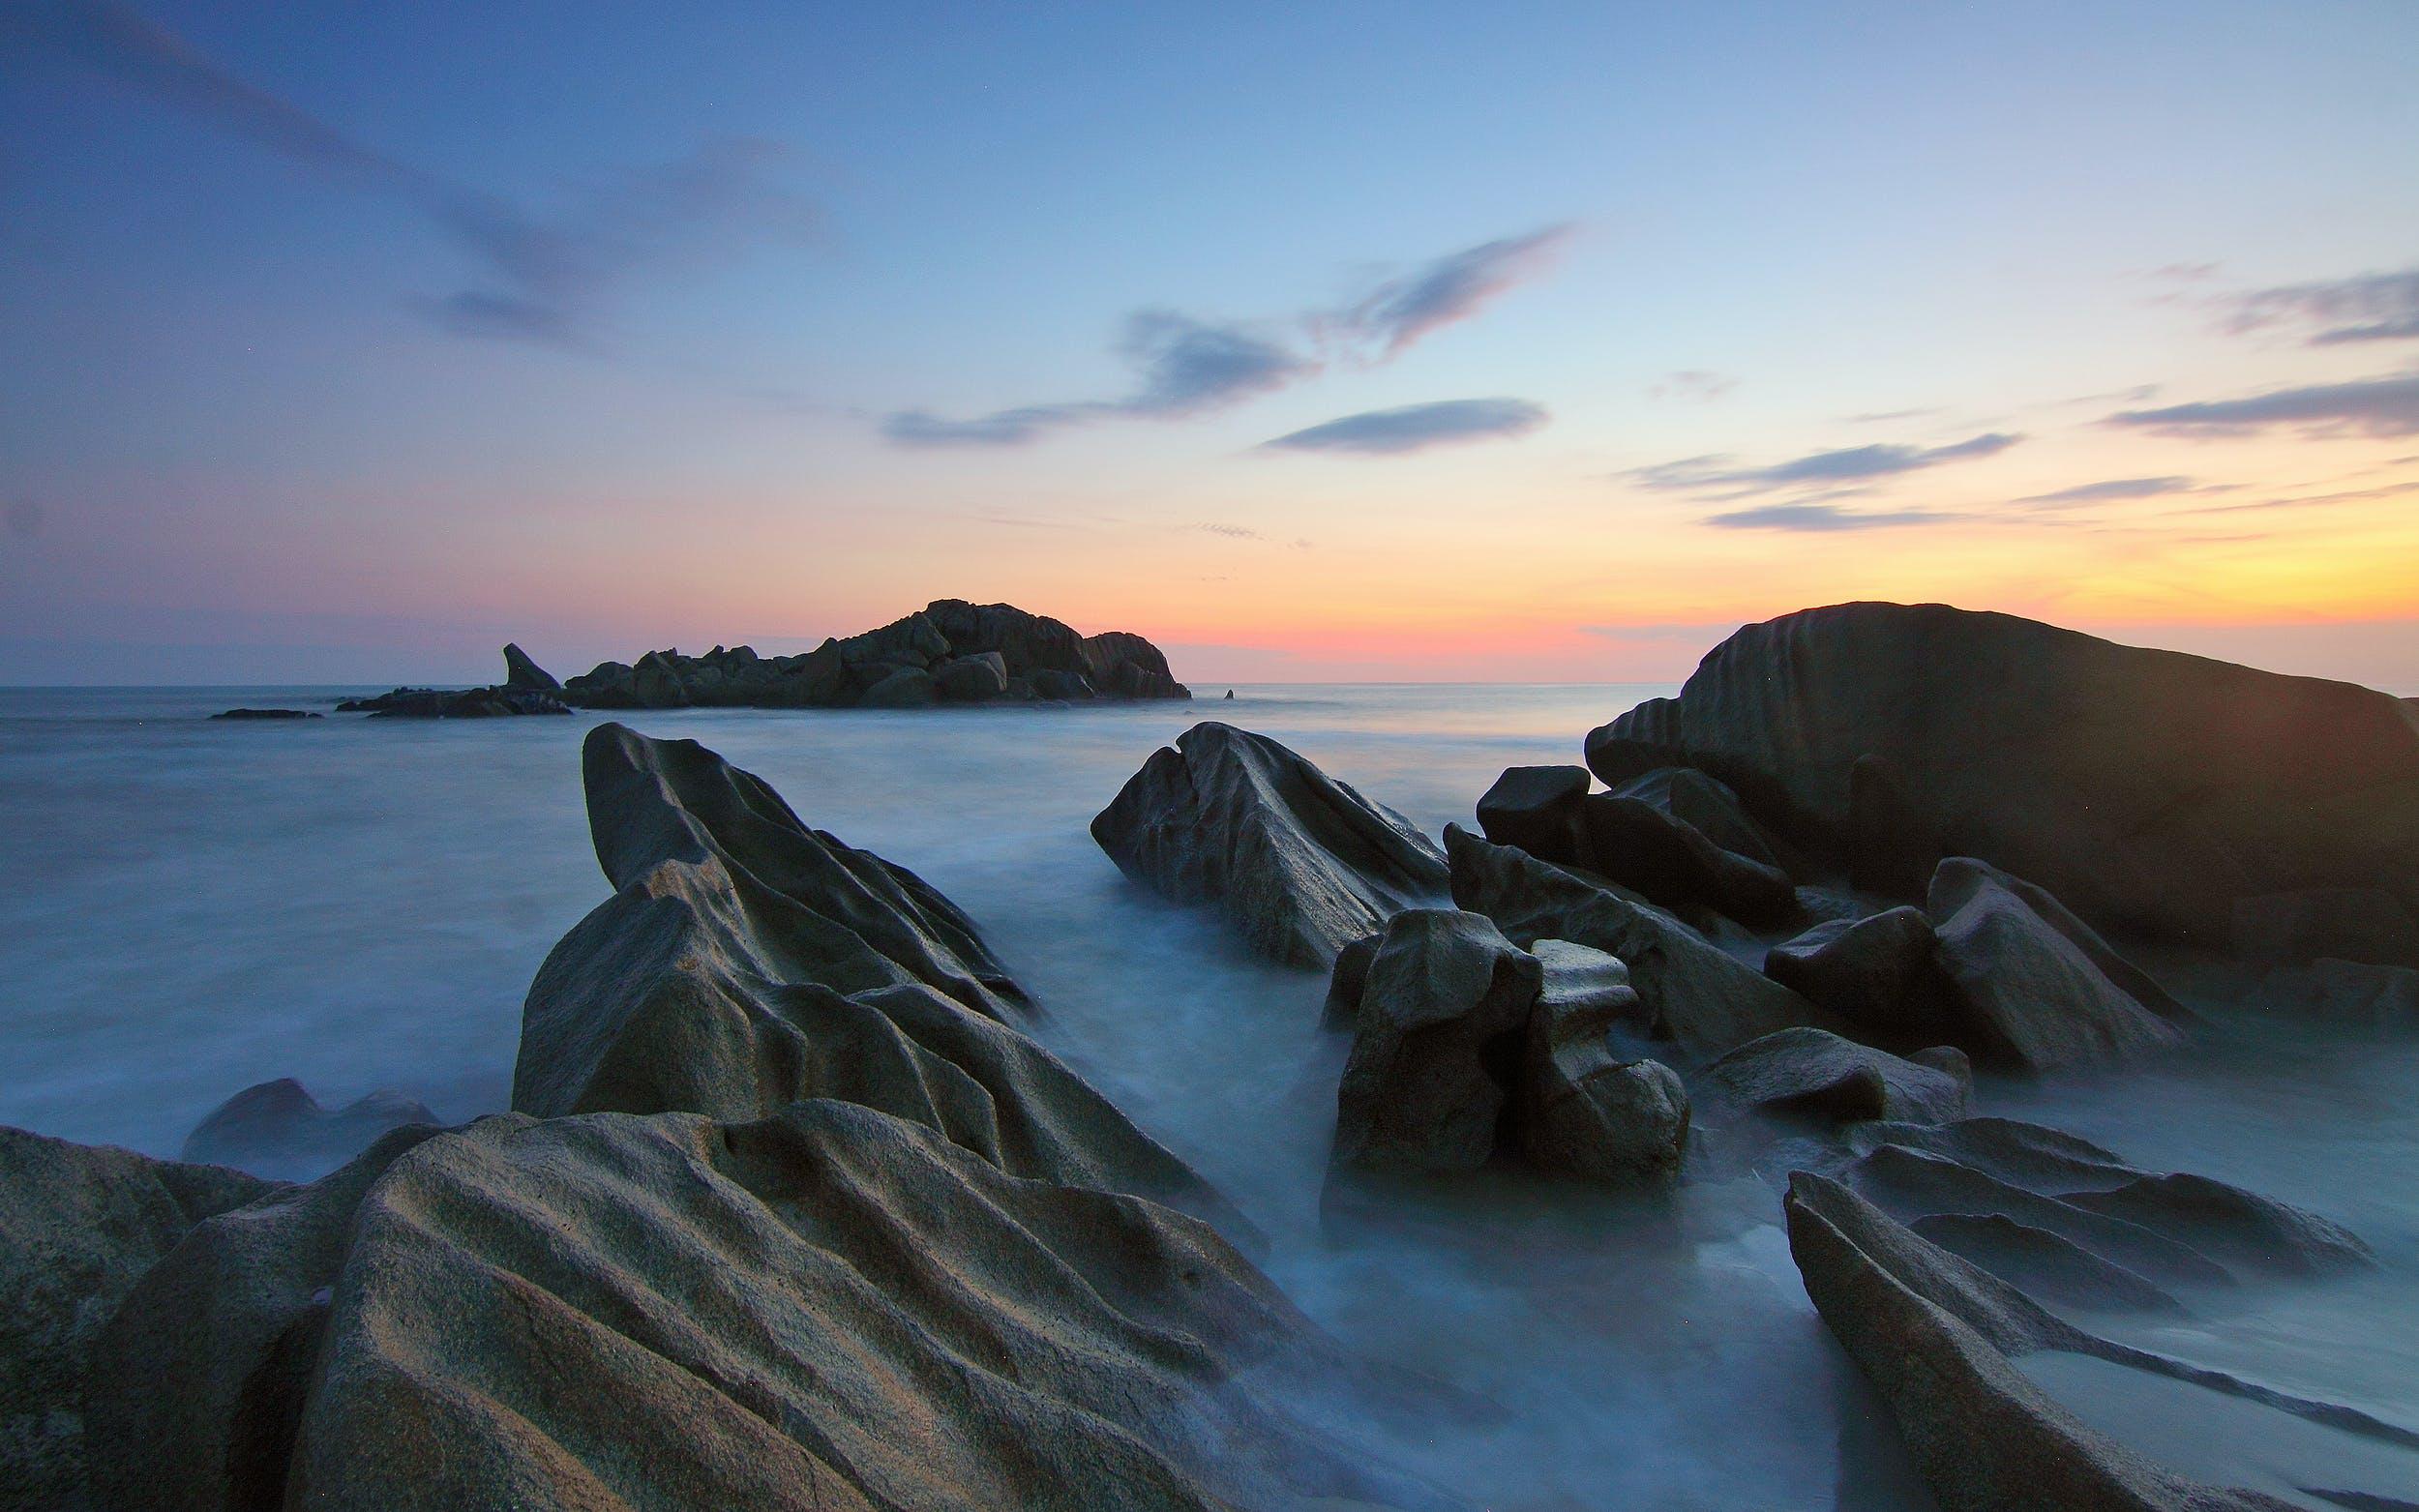 Ocean View on Sunset